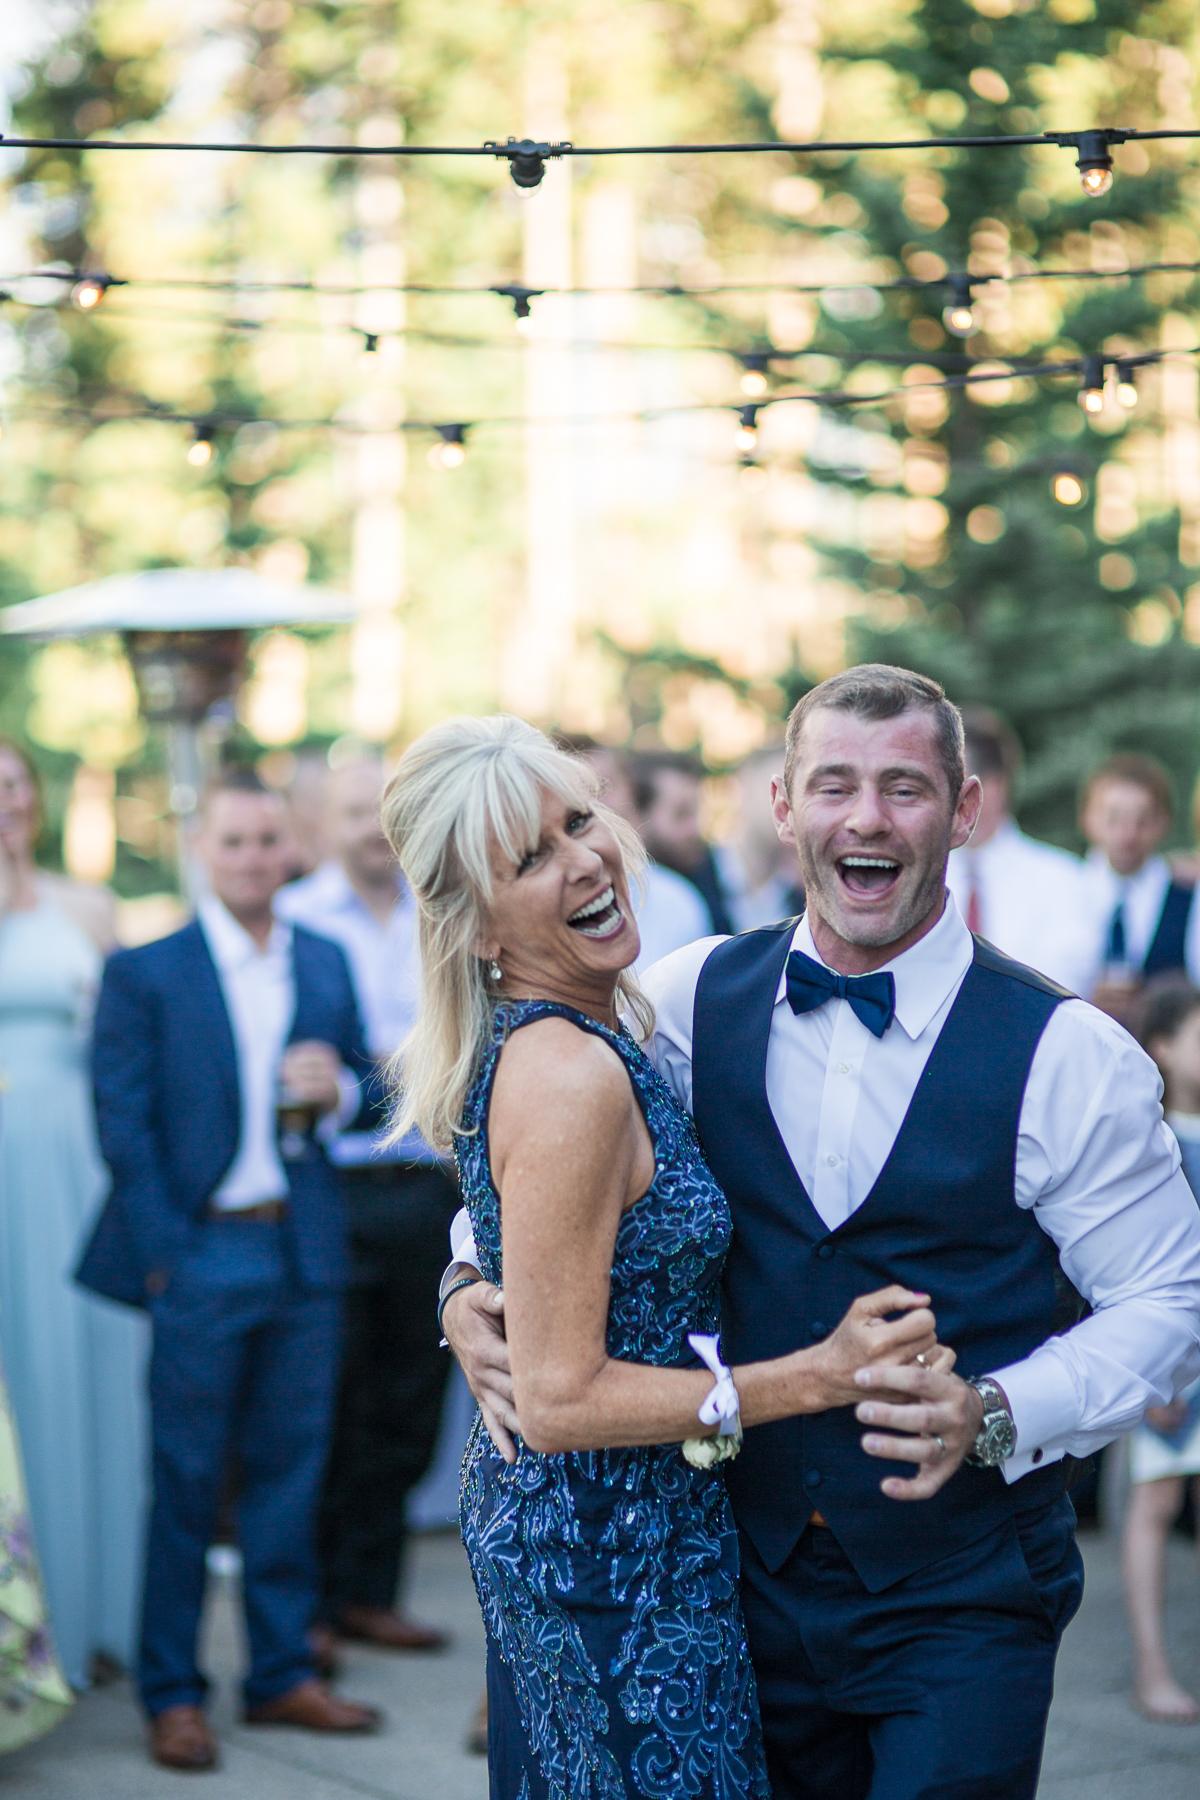 StaciDesign-Colorado-Wedding-5652.jpg